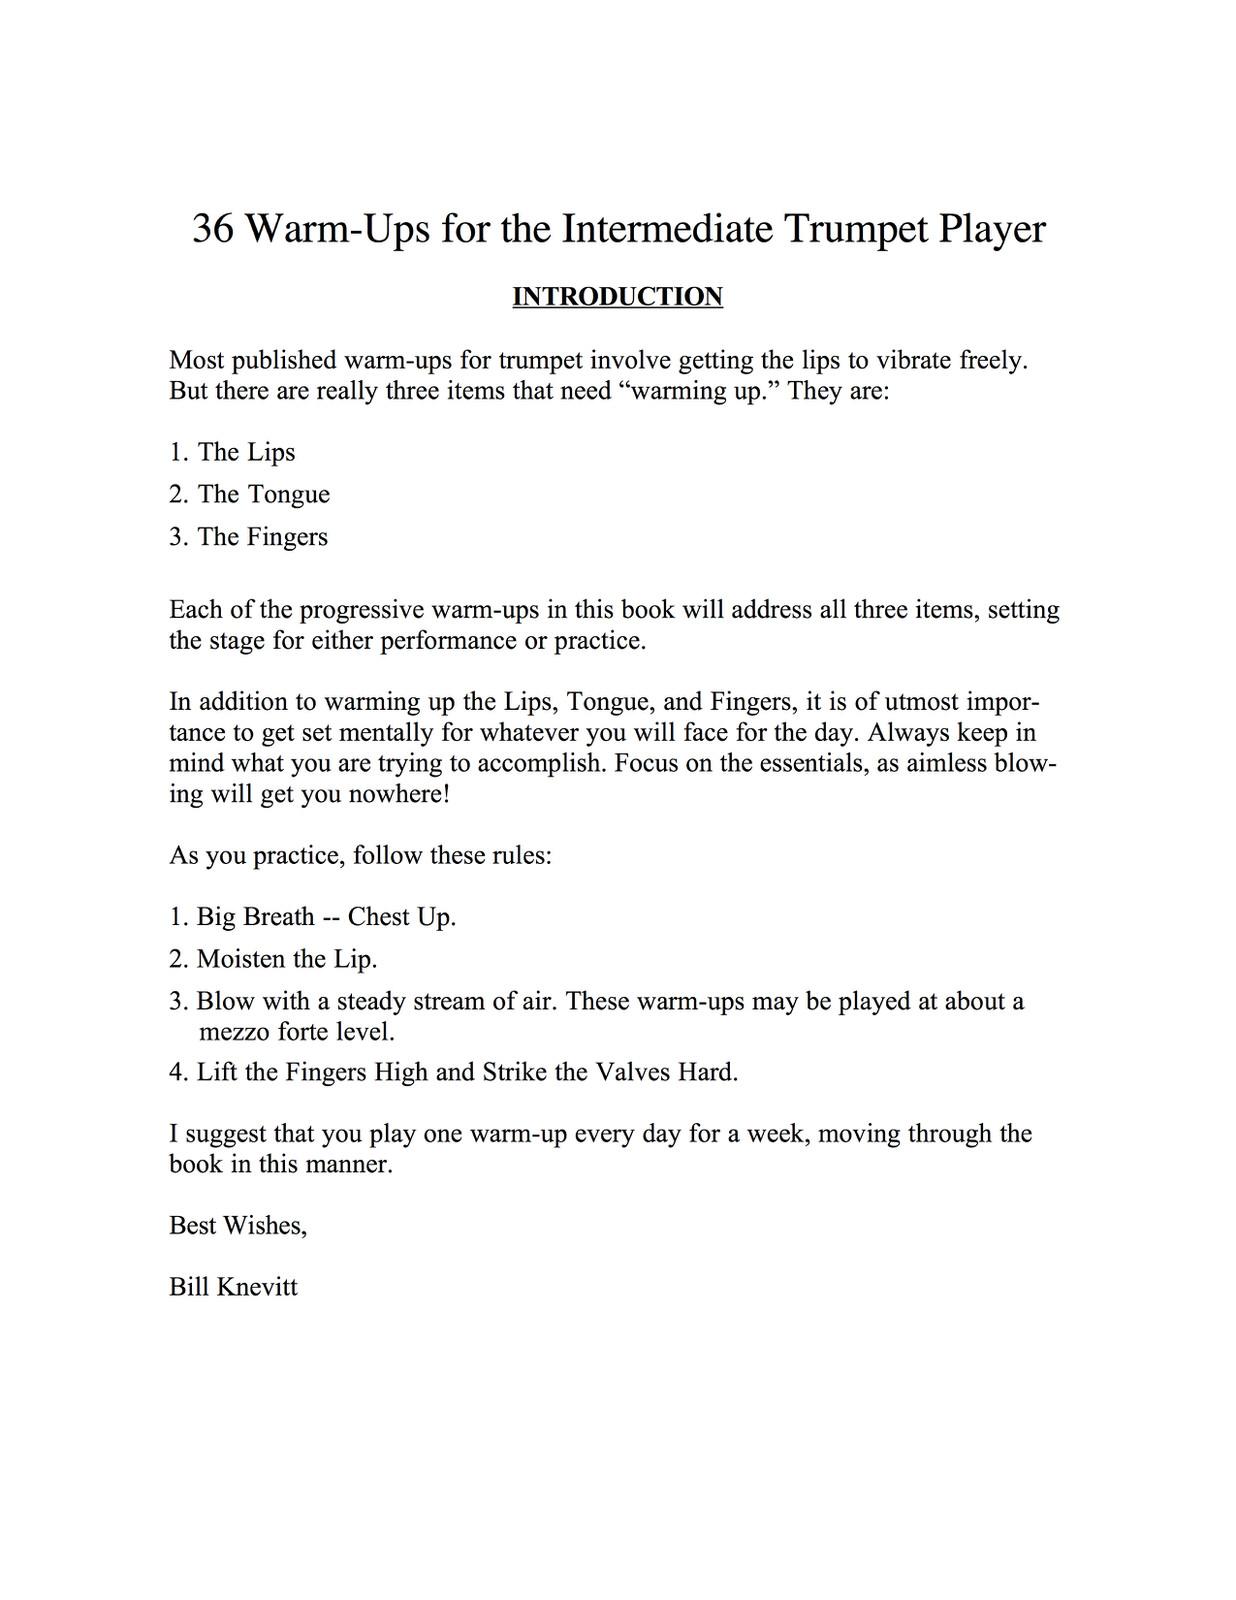 Knevitt, 36 Intermediate warmups-p02